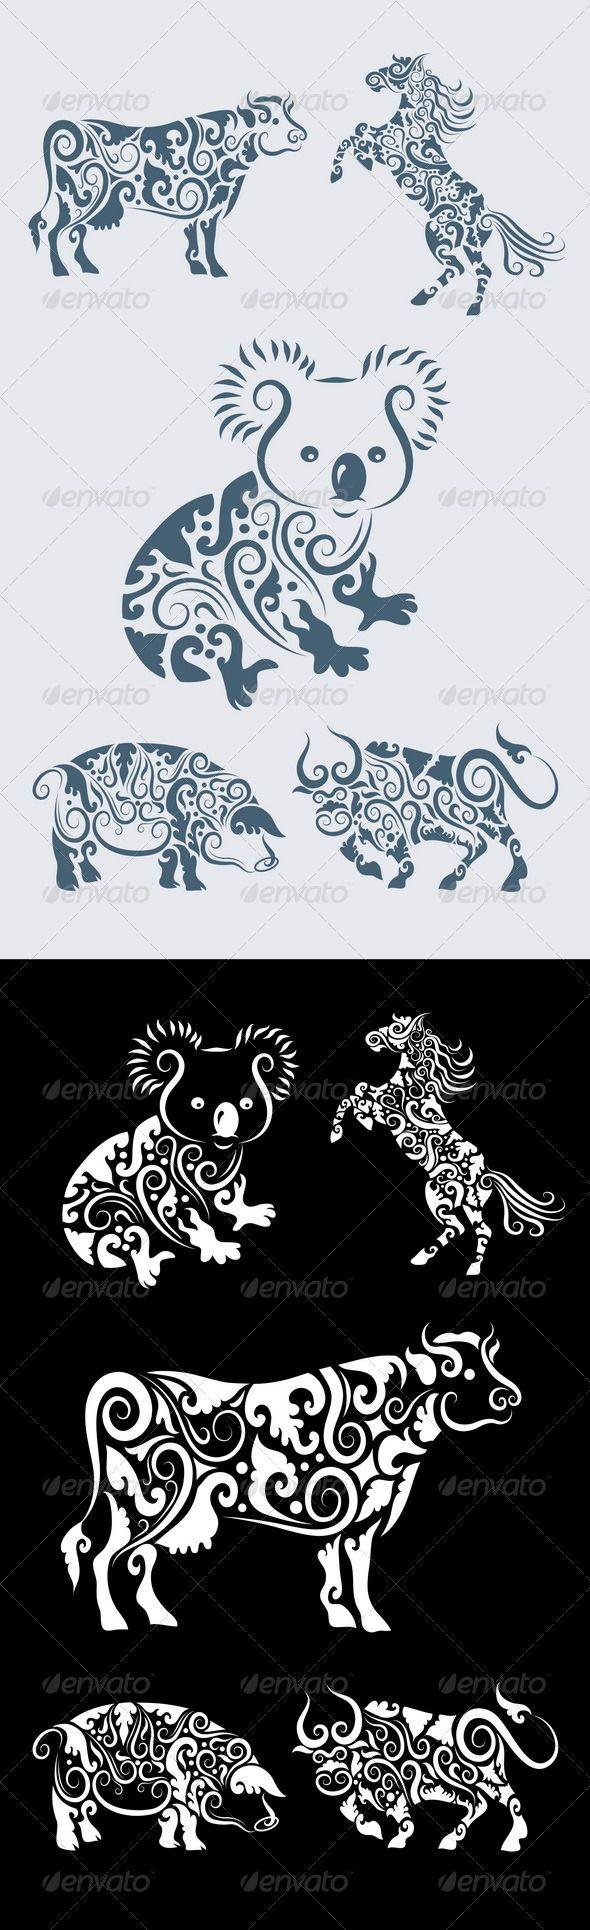 Tattoo Animal Ornaments Animal Design Henna Animal Floral Zhivotnye